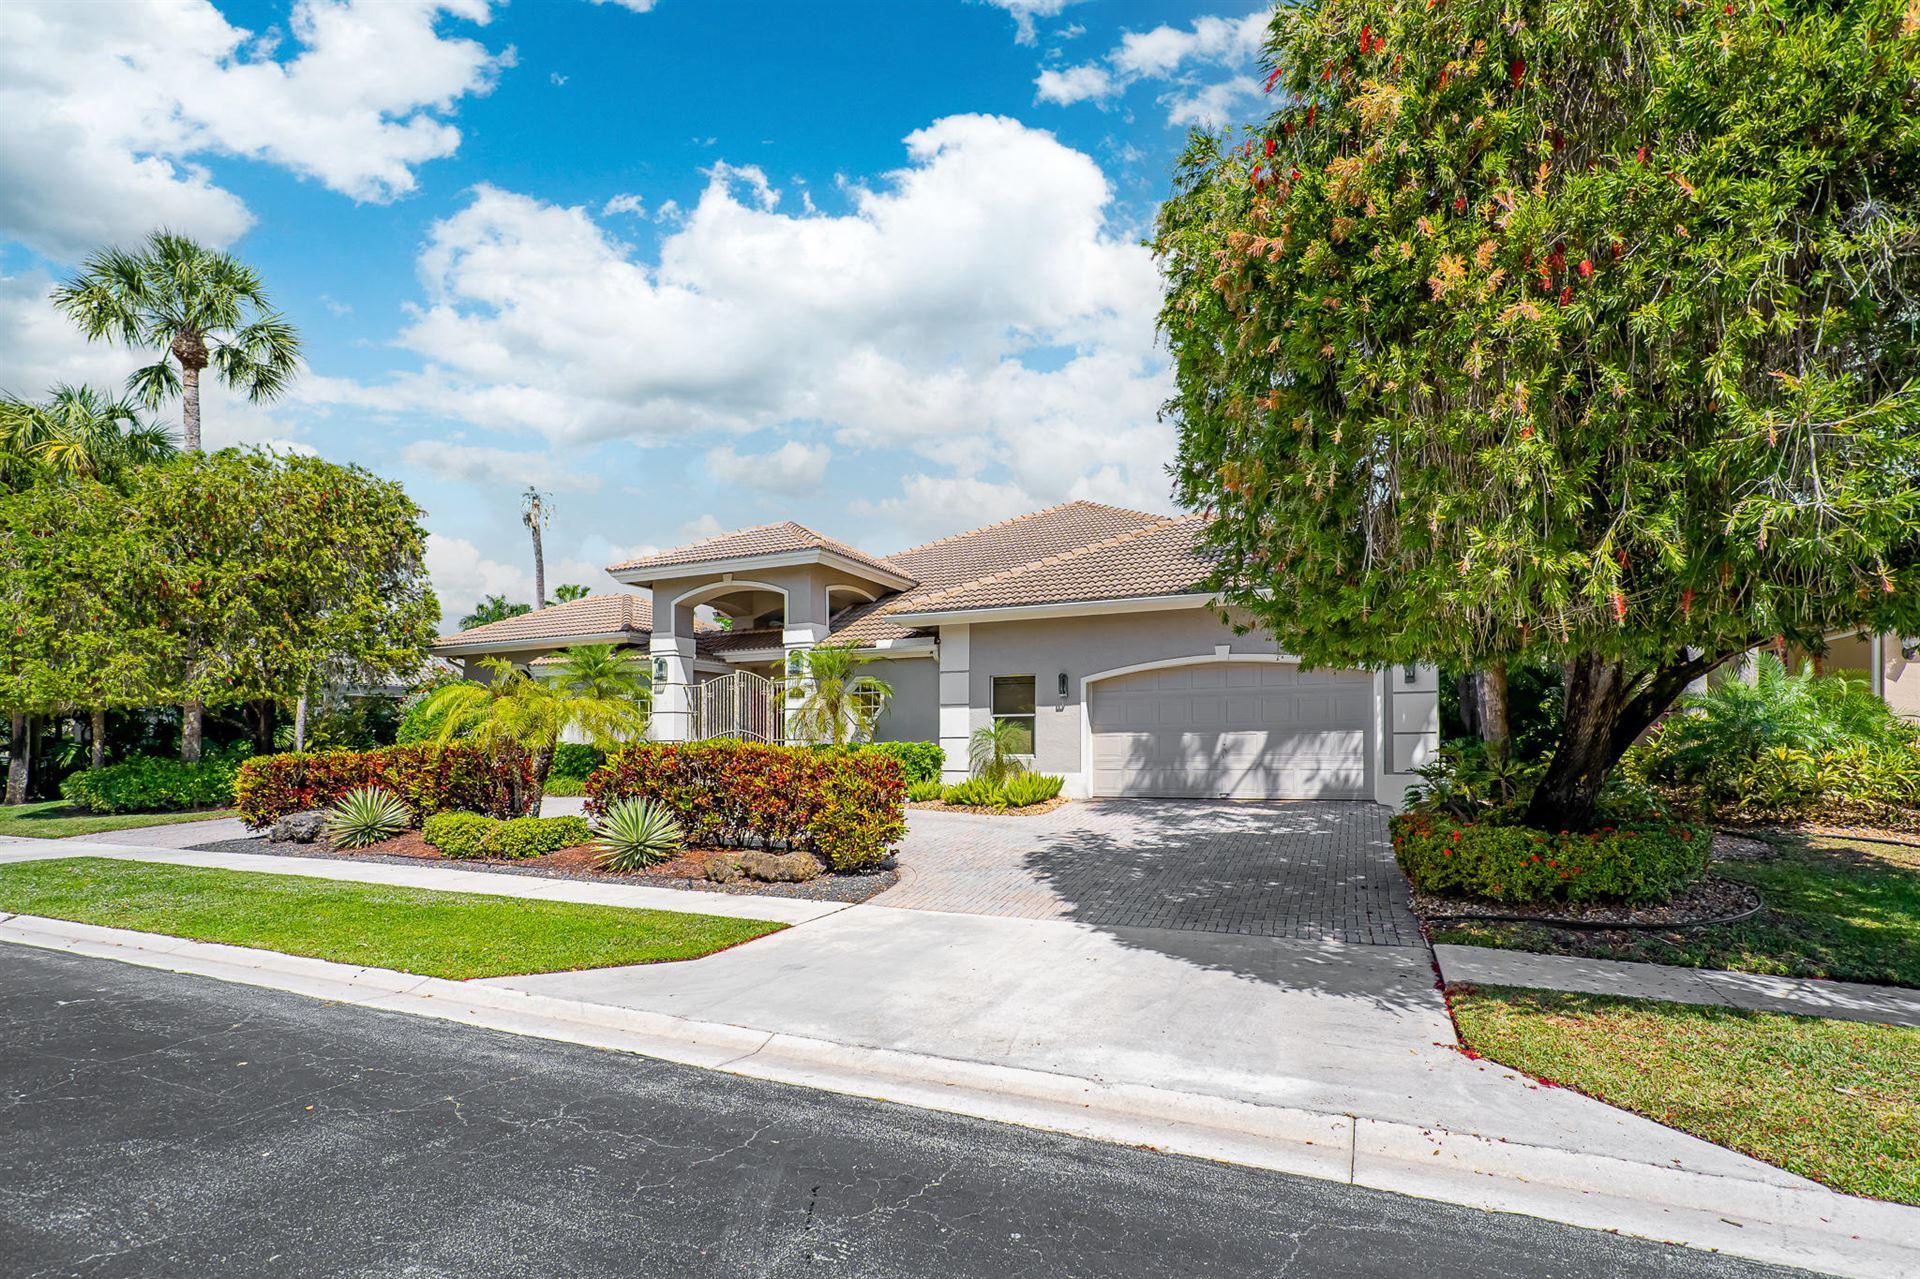 7075 Siena Court, Boca Raton, FL 33433 - #: RX-10708041